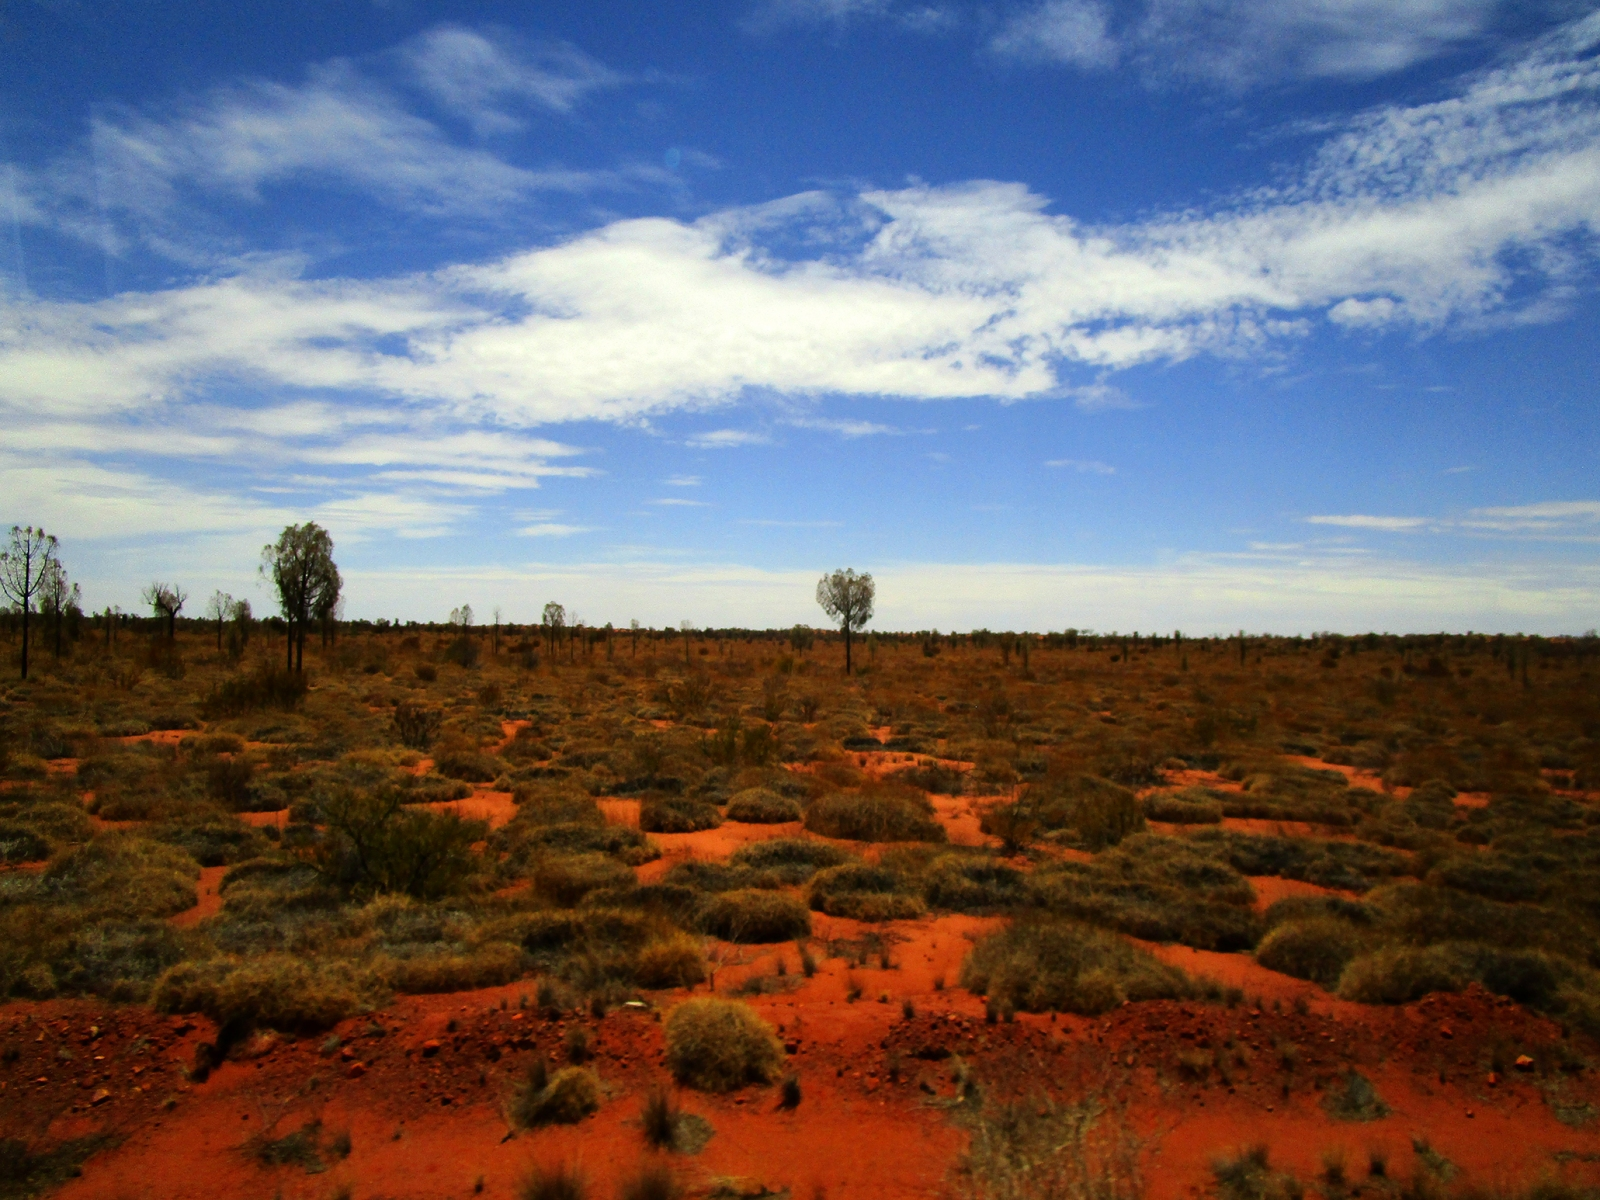 Outback in Australia